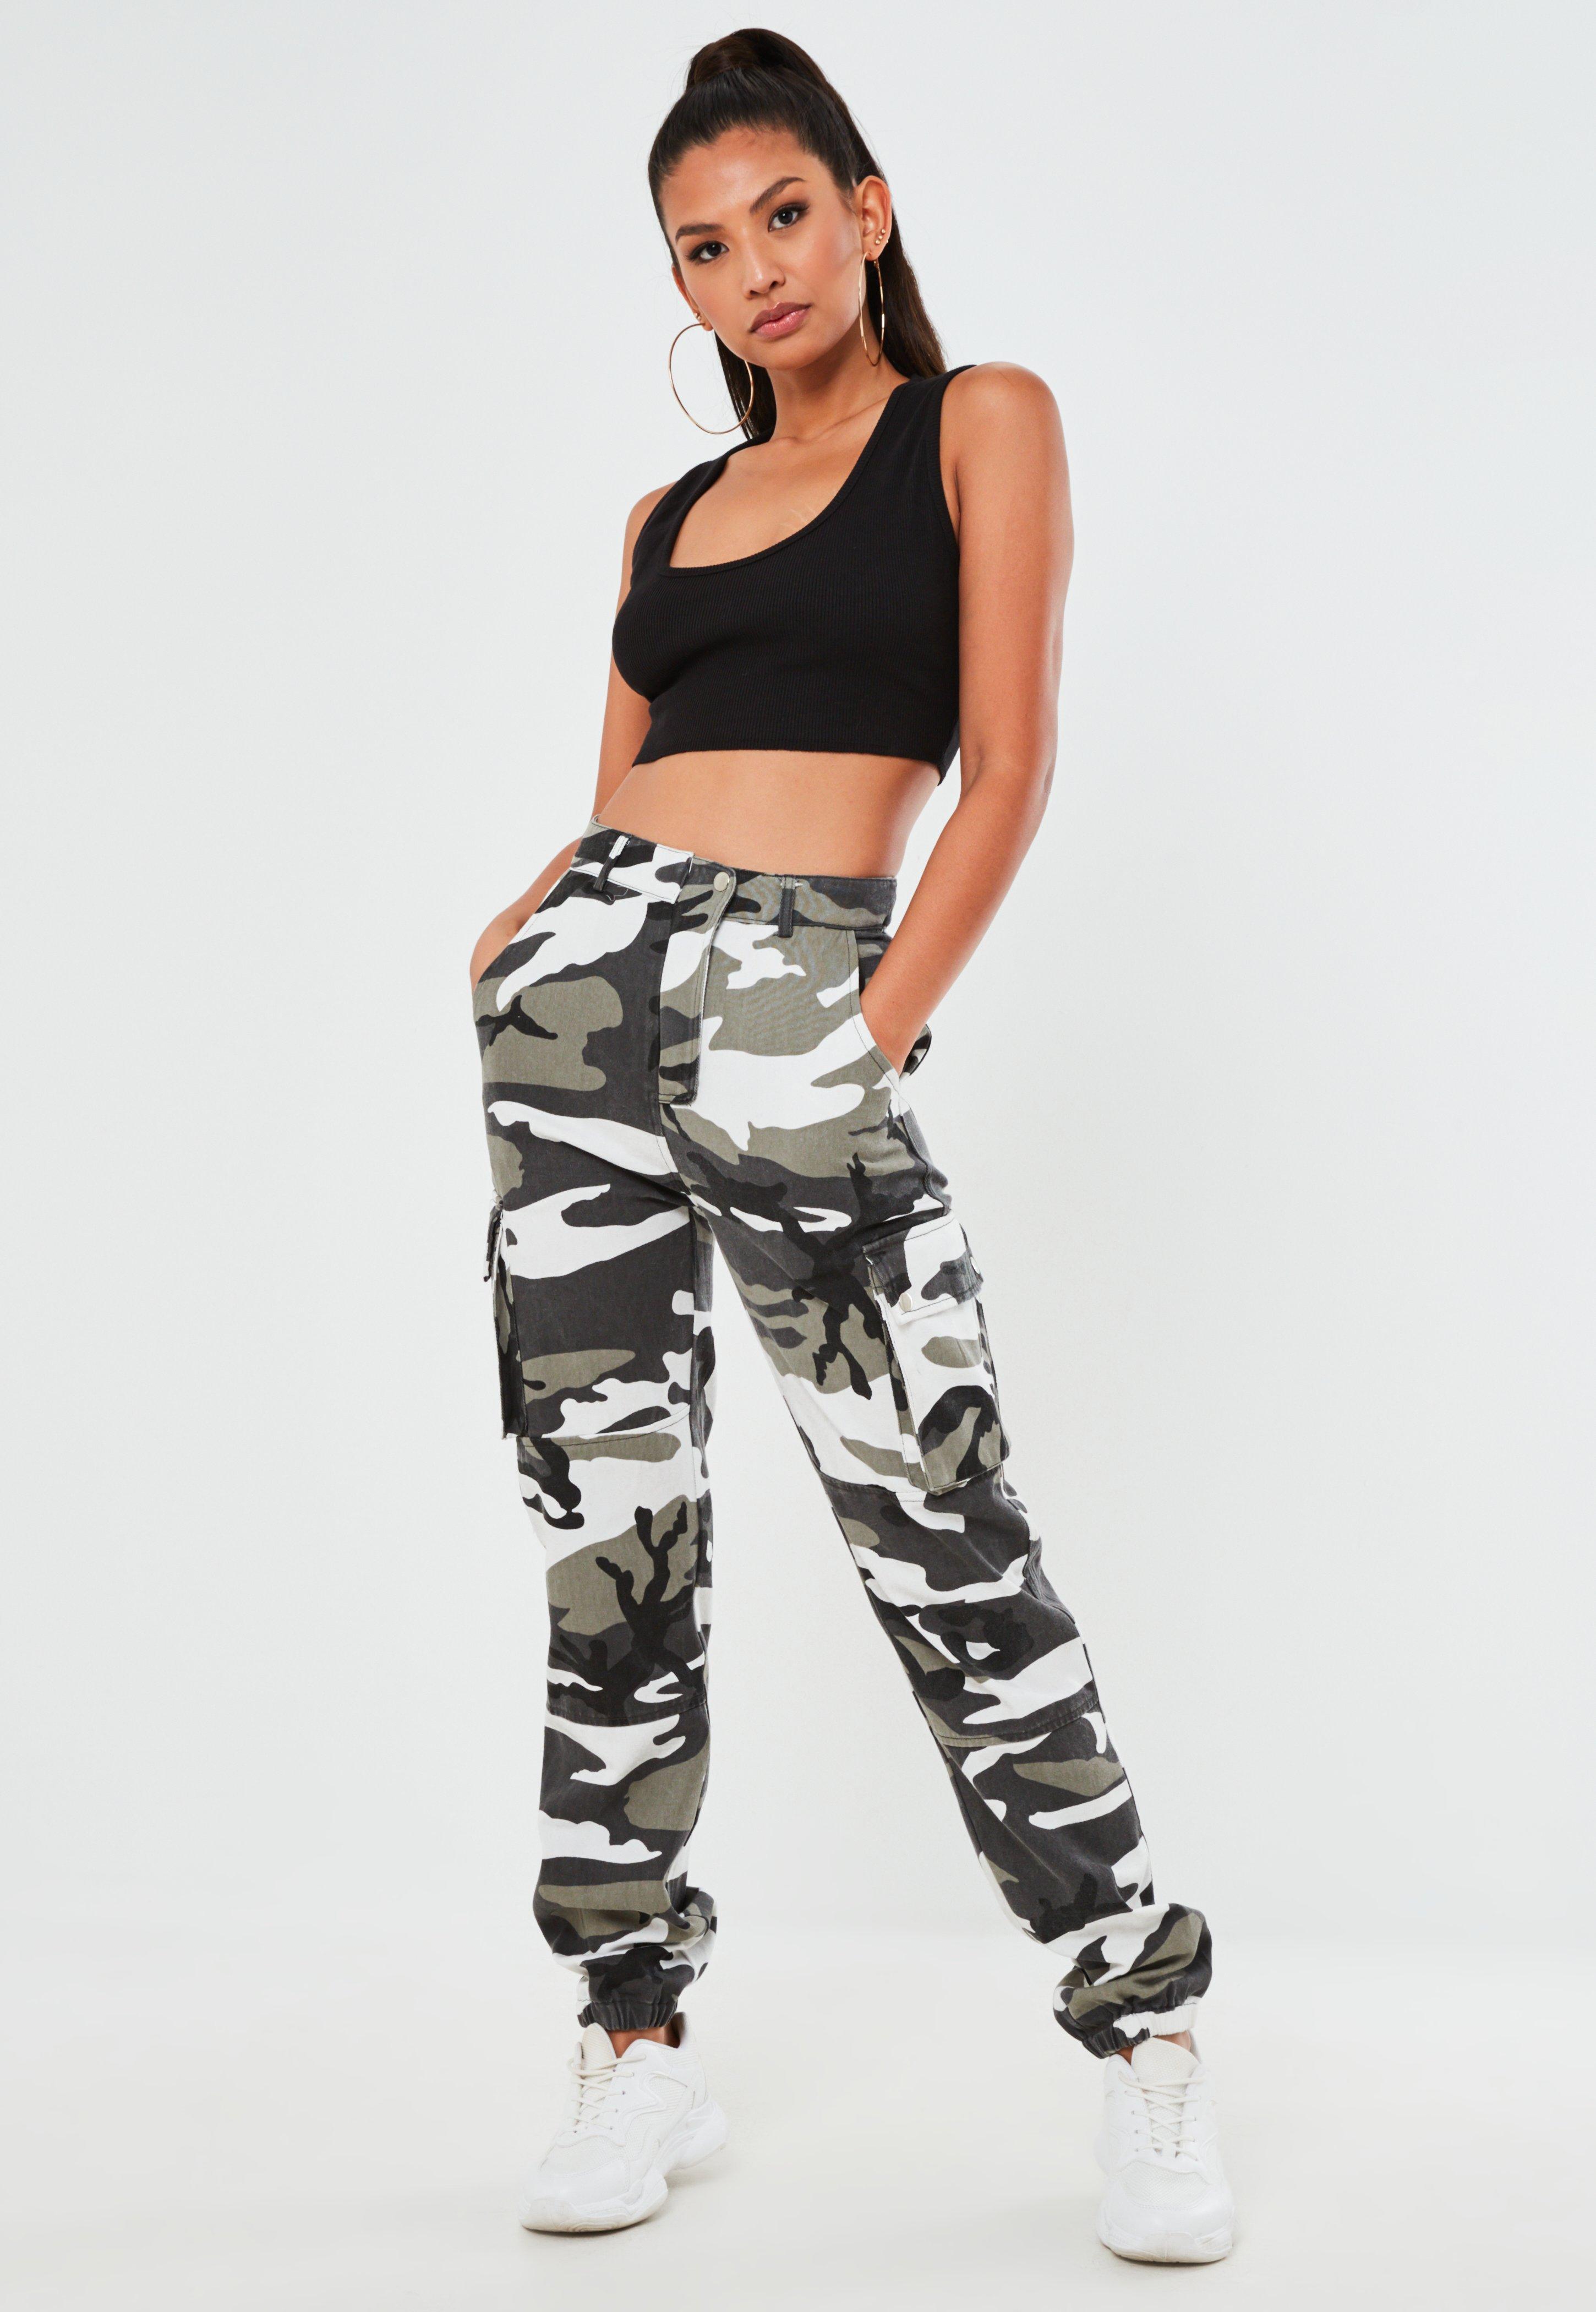 7b54554f7a5 Pantalon cargo gris imprimé camouflage